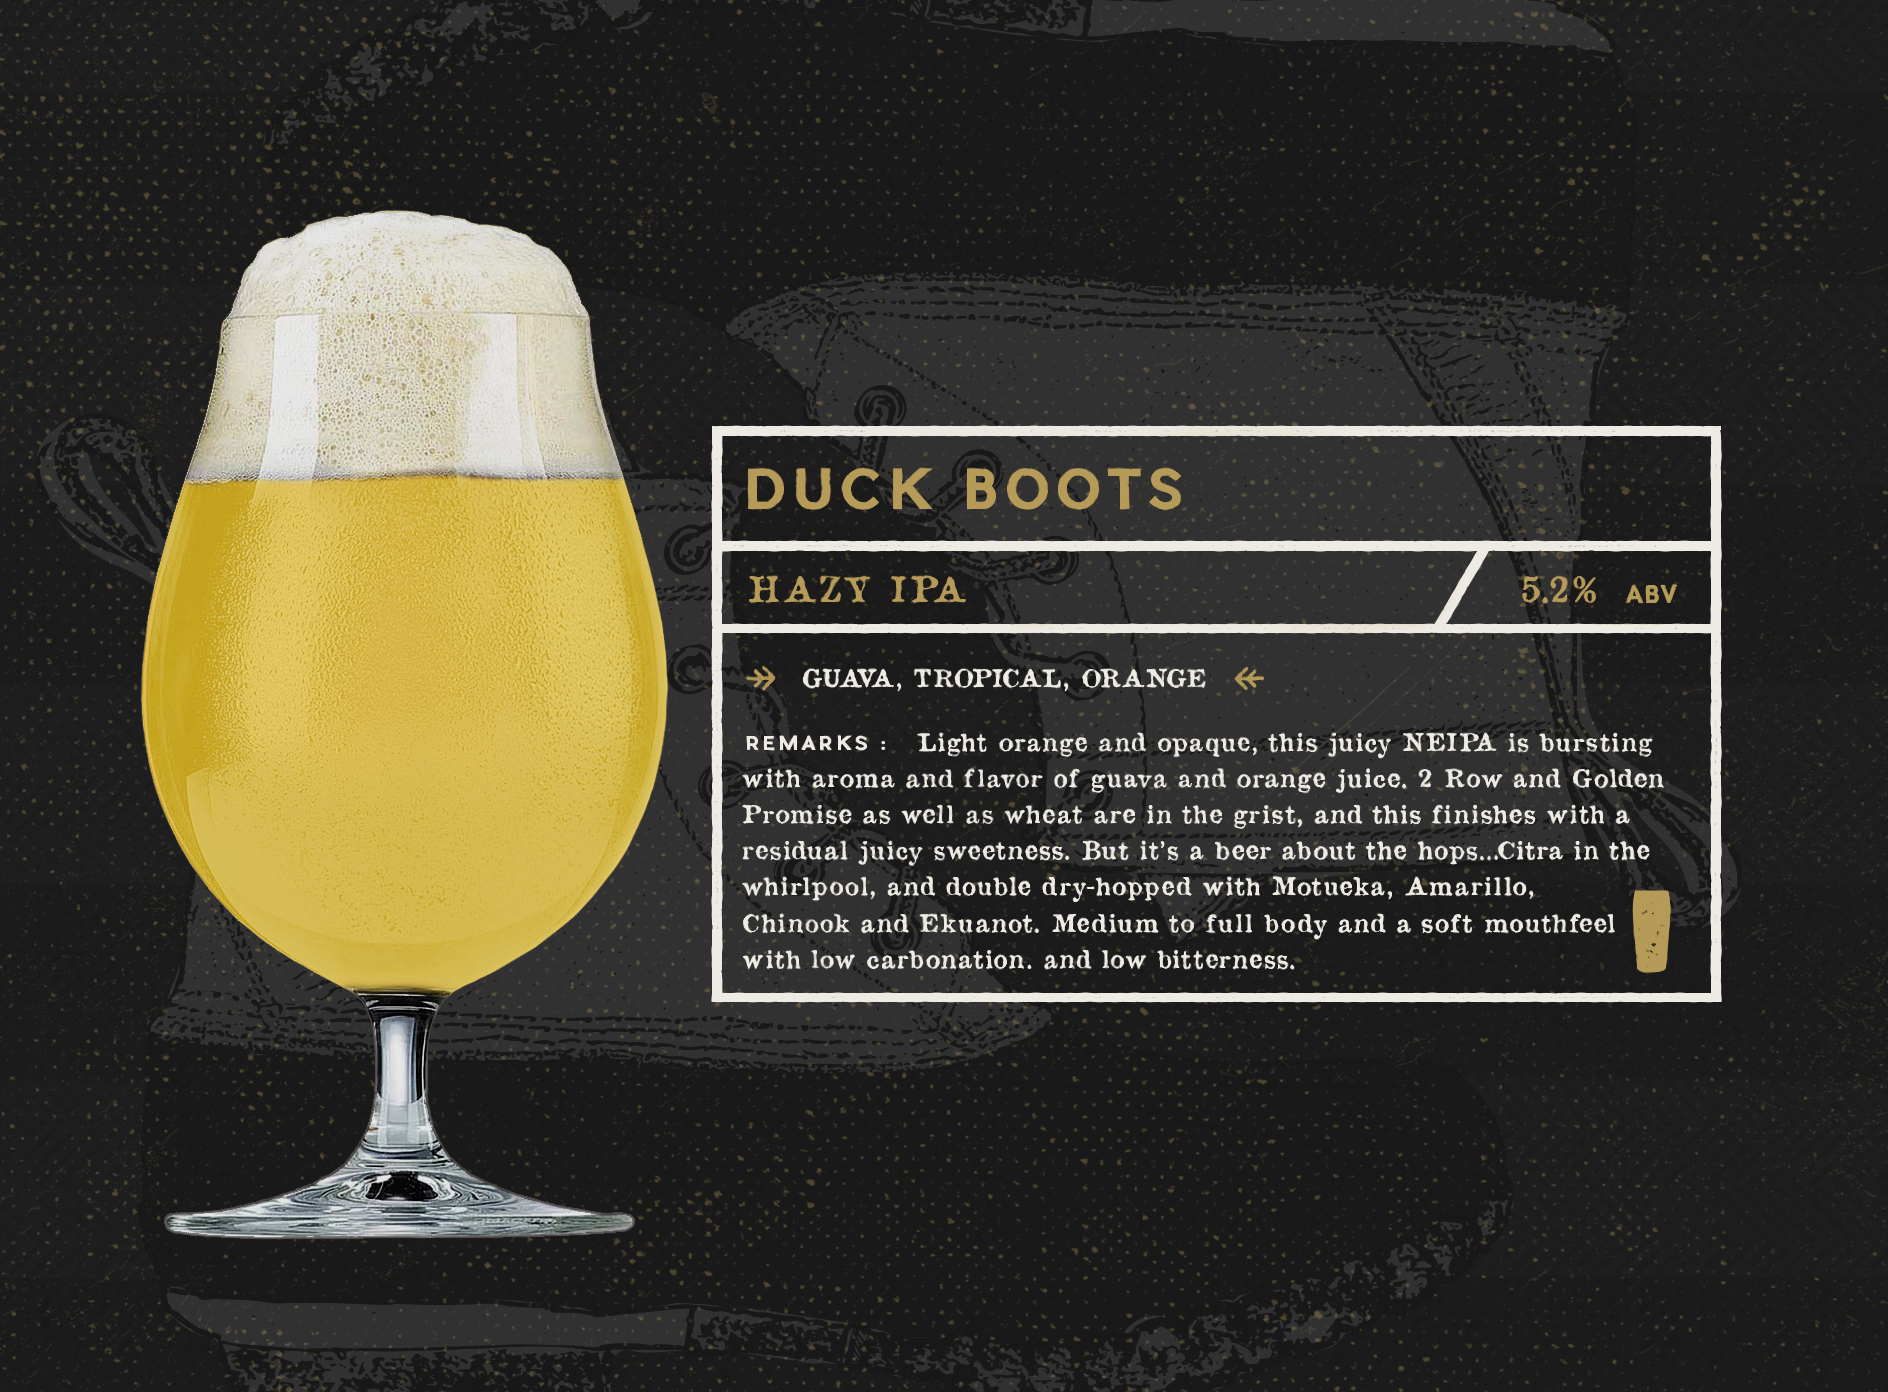 Gunwhale_duckBoots_beer.jpg